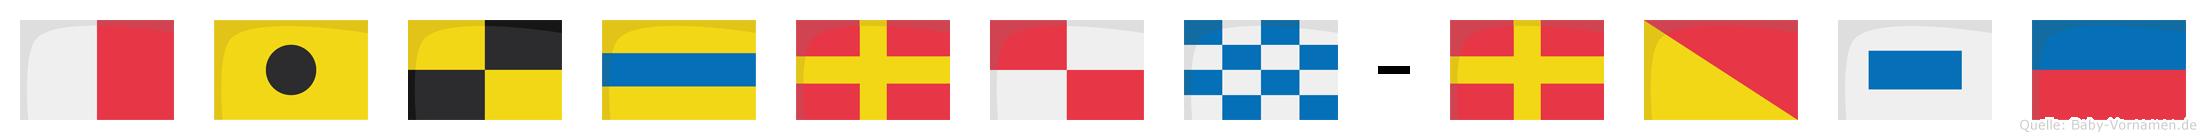 Hildrun-Rose im Flaggenalphabet